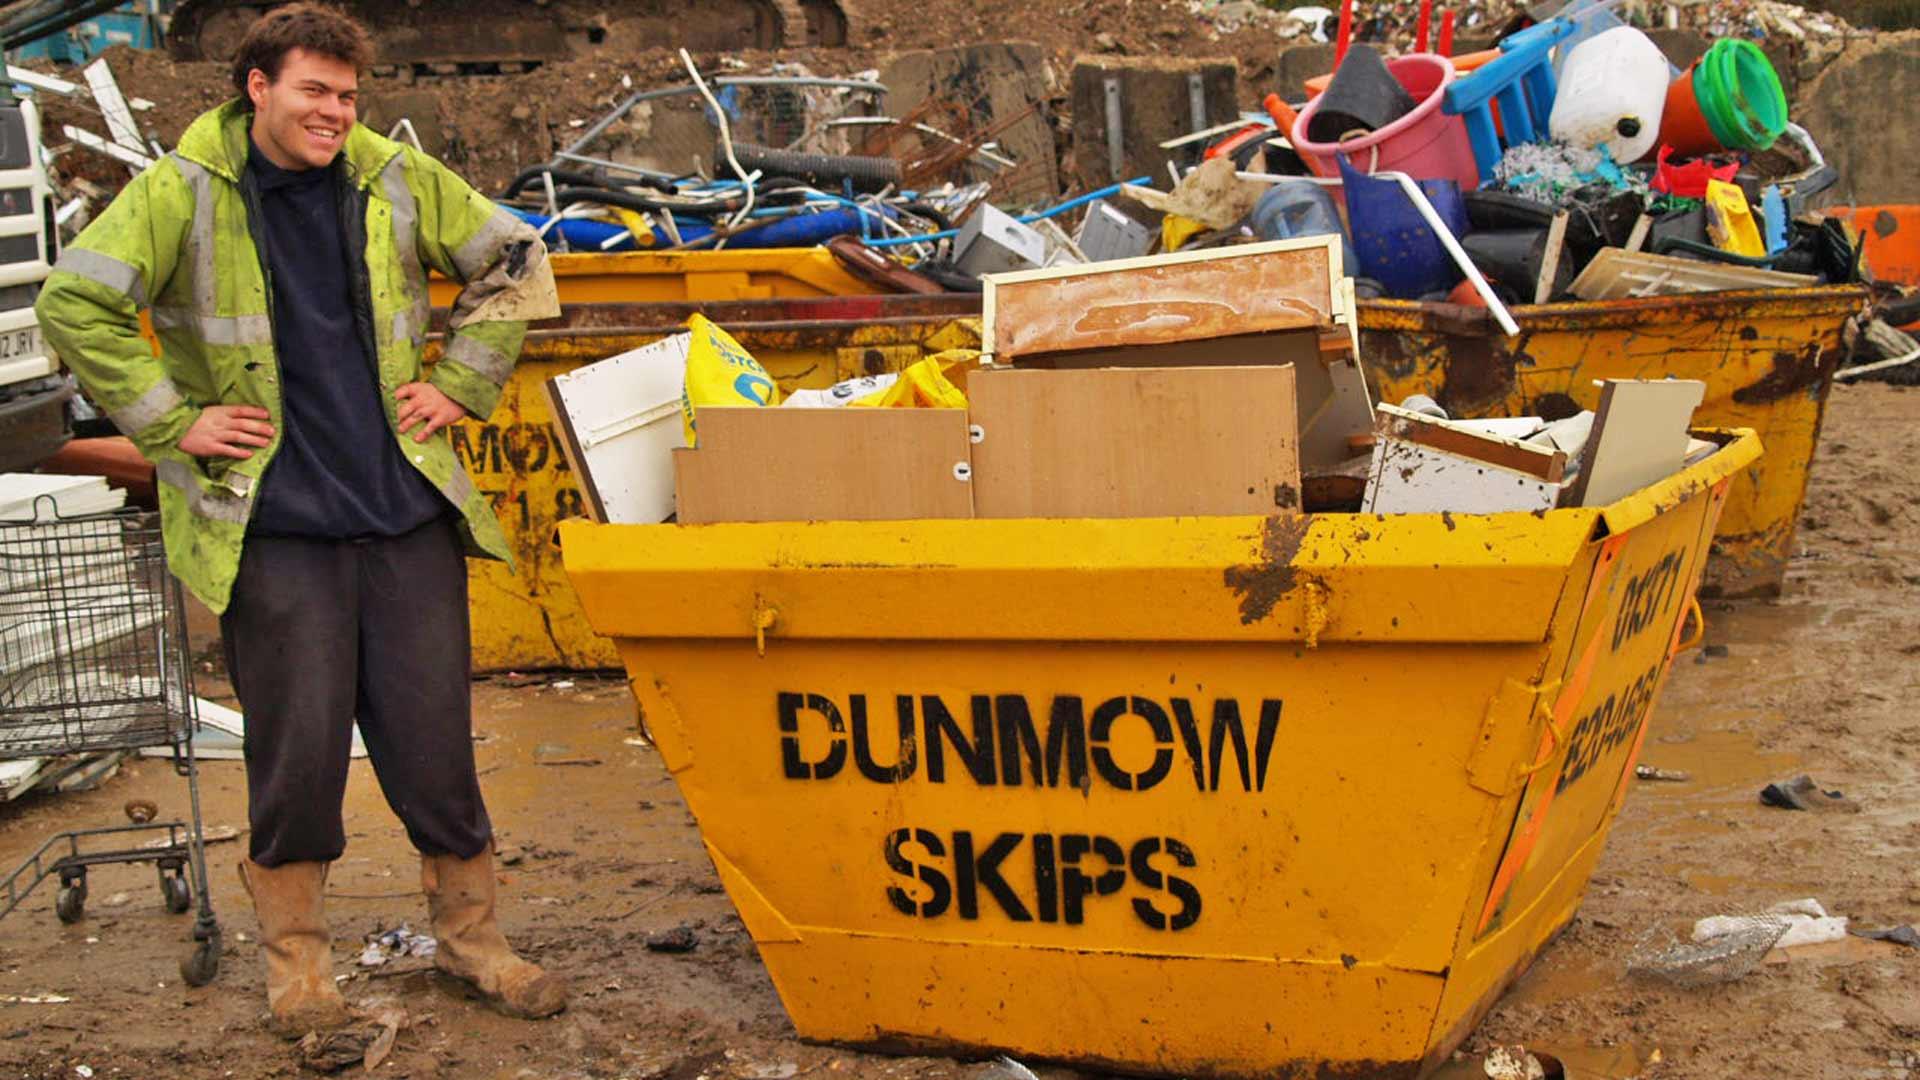 27-Dunmow-Skip-Hire-History